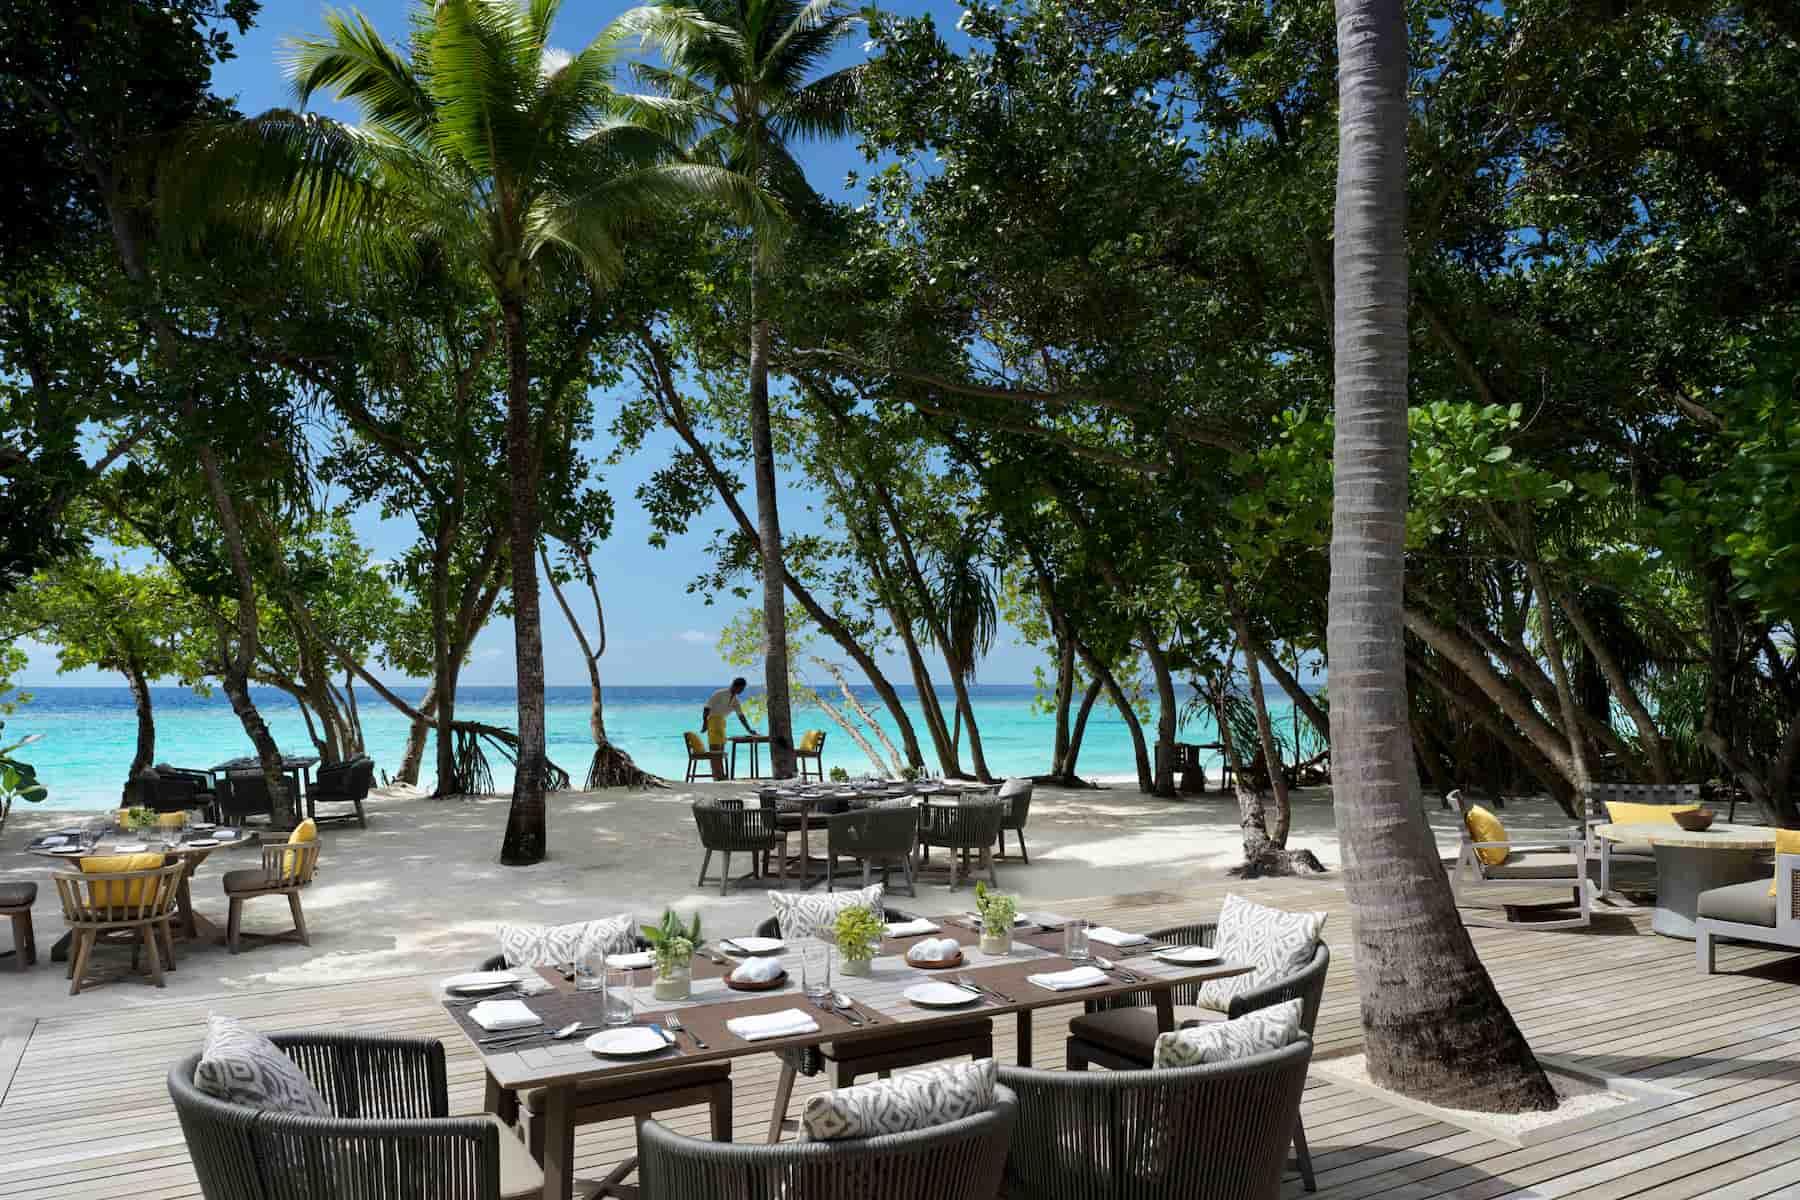 Resort Maldive VAkkaru Amaany Ristorante